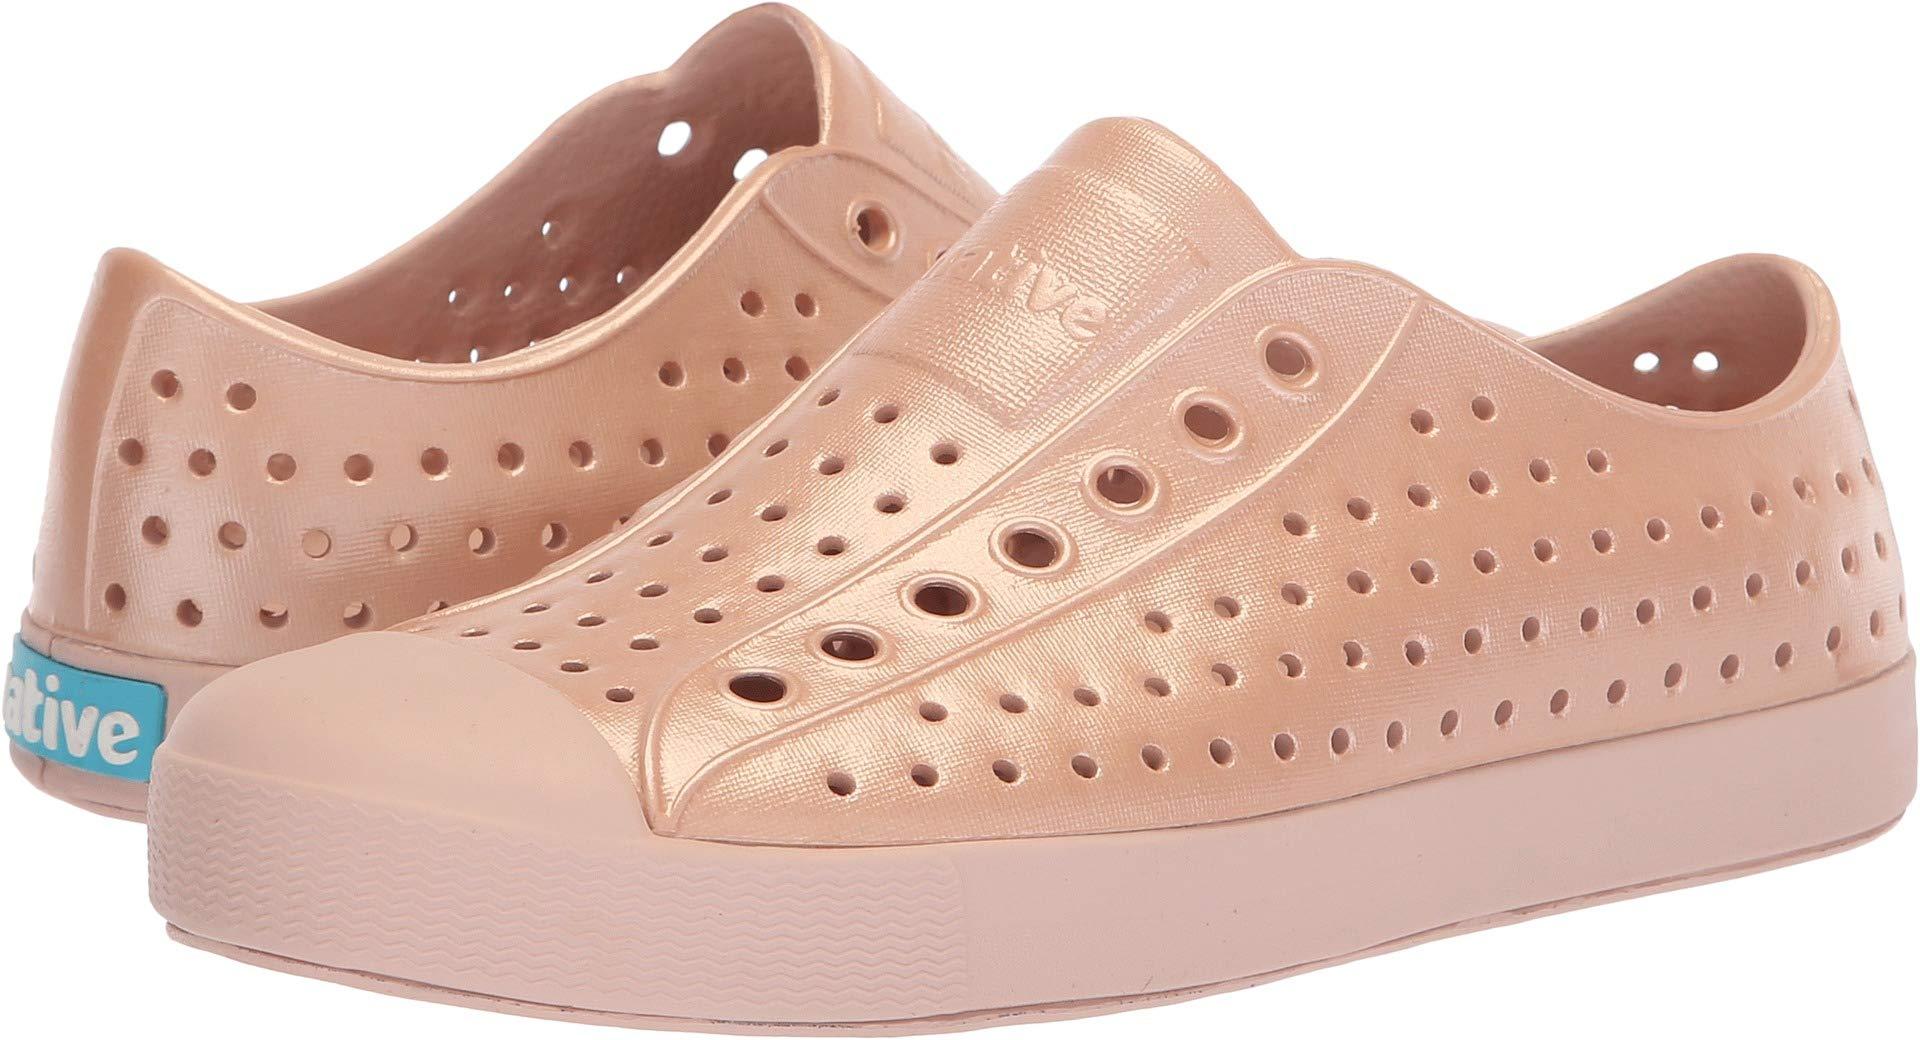 Native Shoes Unisex Jefferson Chameleon Metallic/Chameleon Pink 5 Women / 3 Men M US